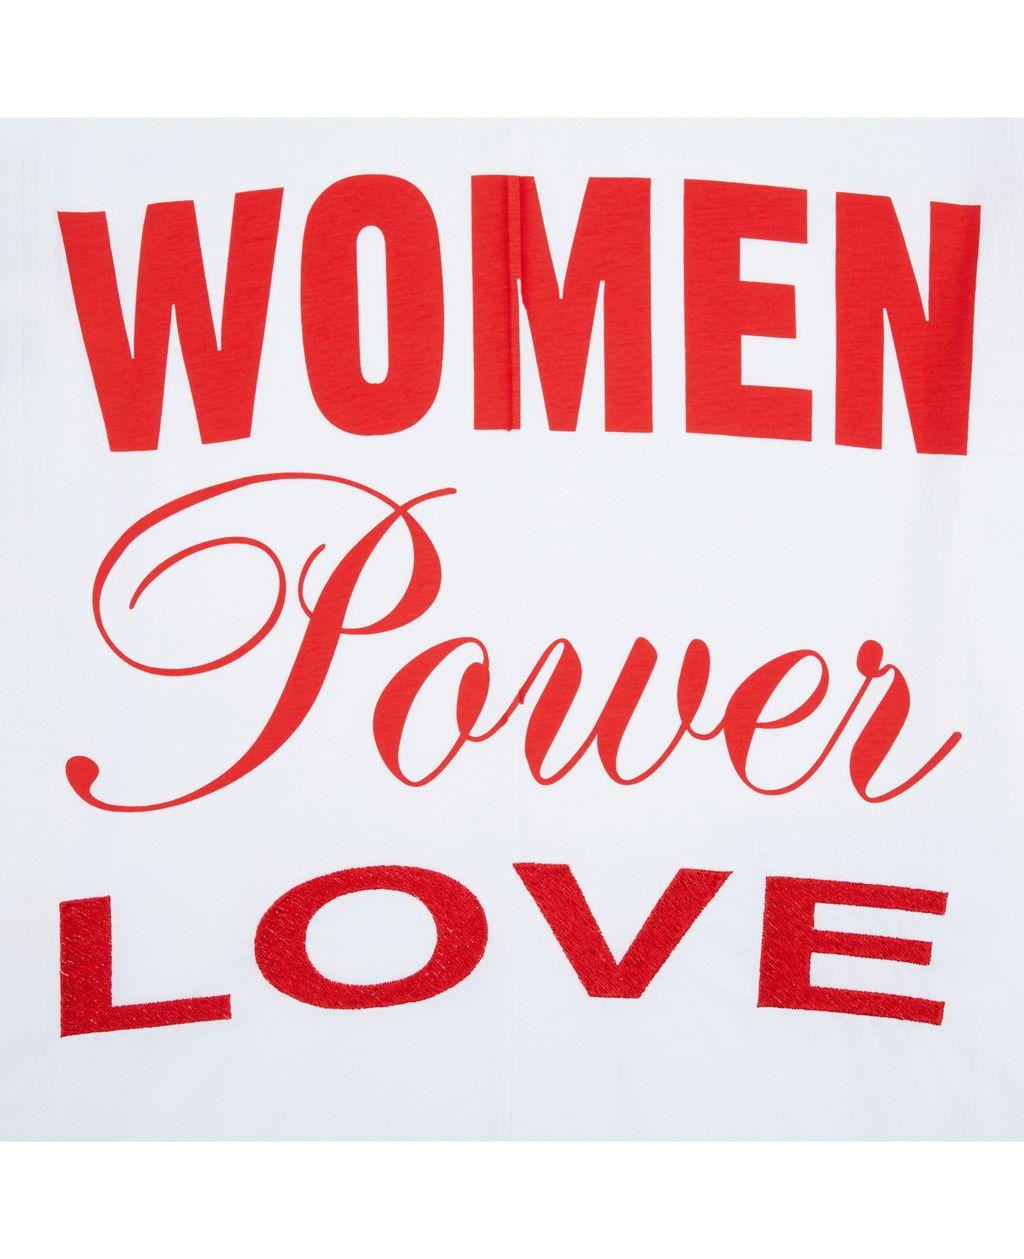 T-shirt powered by women  - STELLA MCCARTNEY